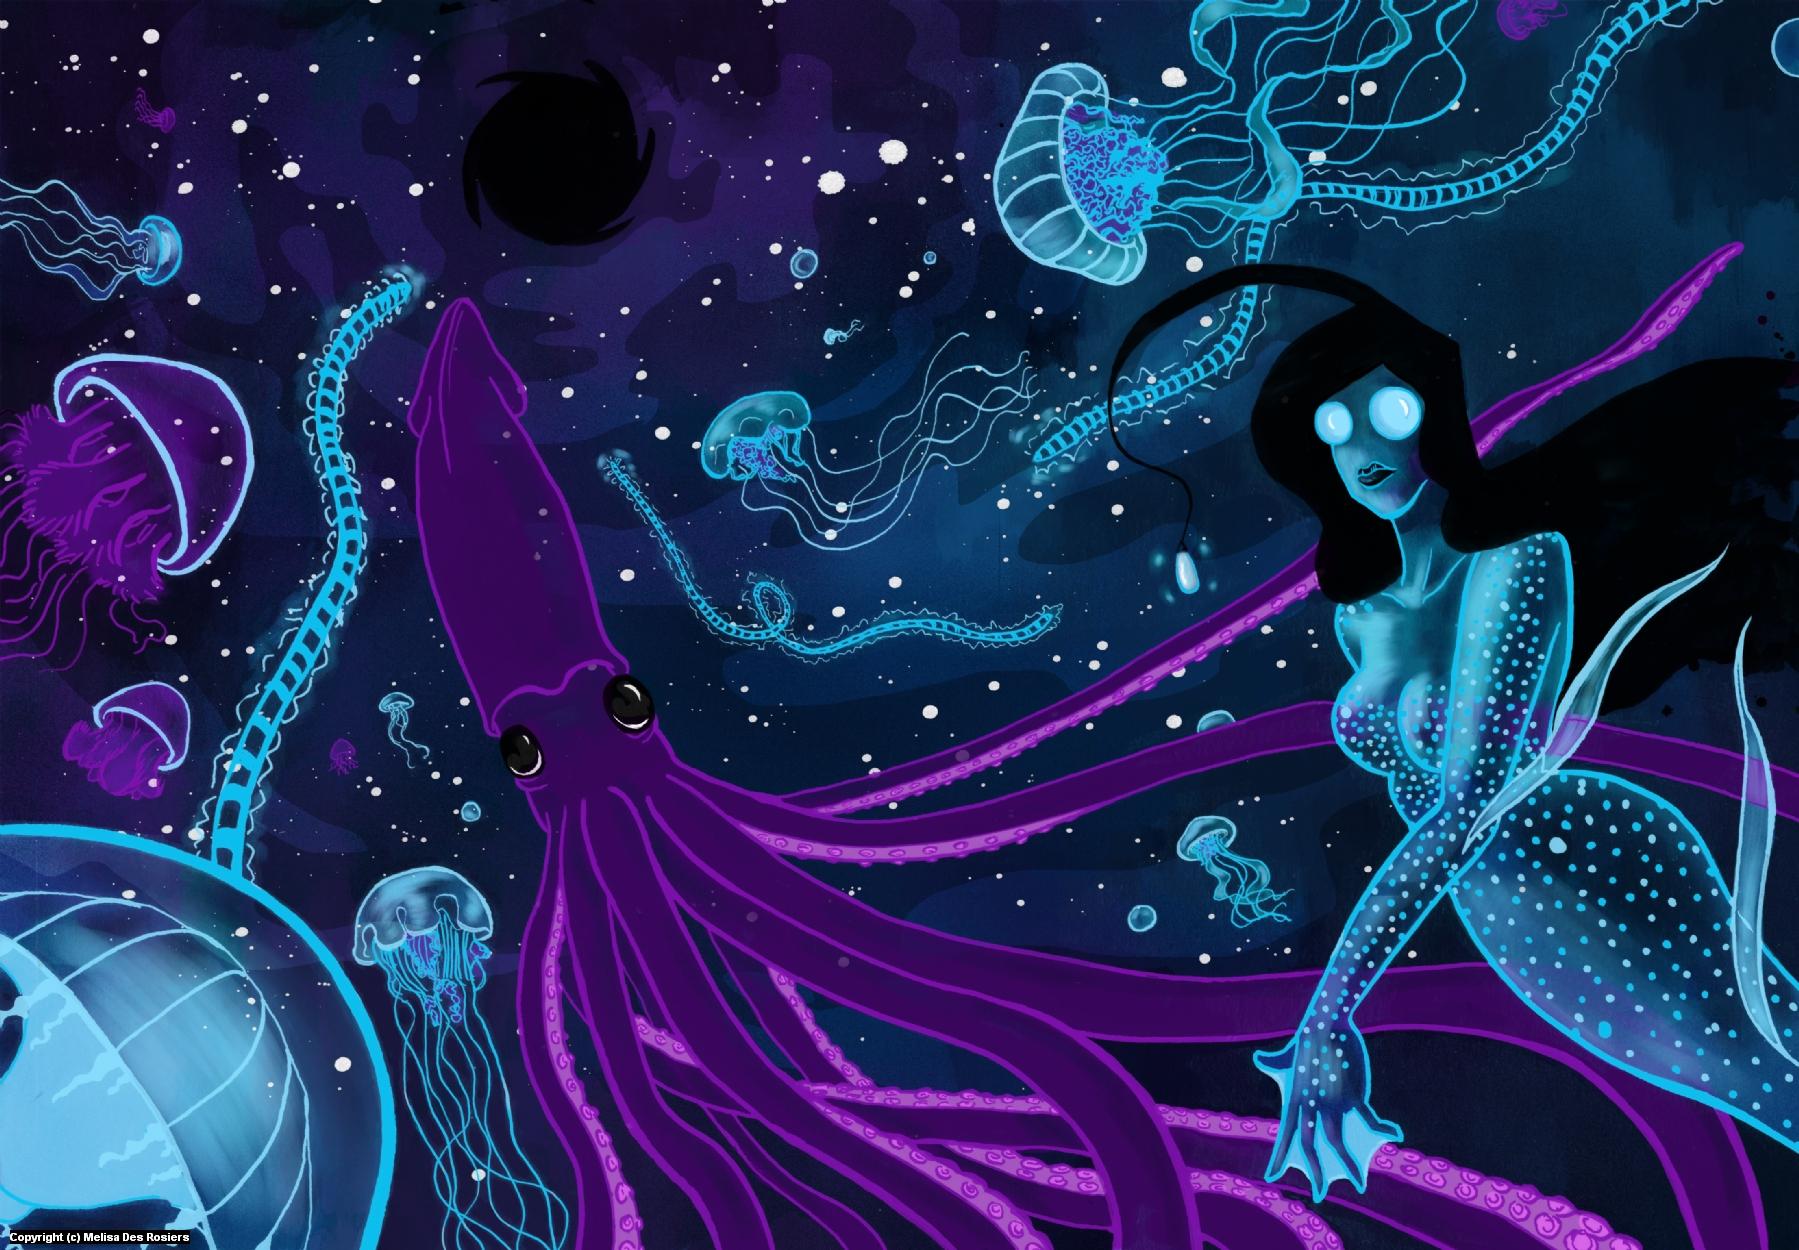 Sacred Black Artwork by Melisa Des Rosiers